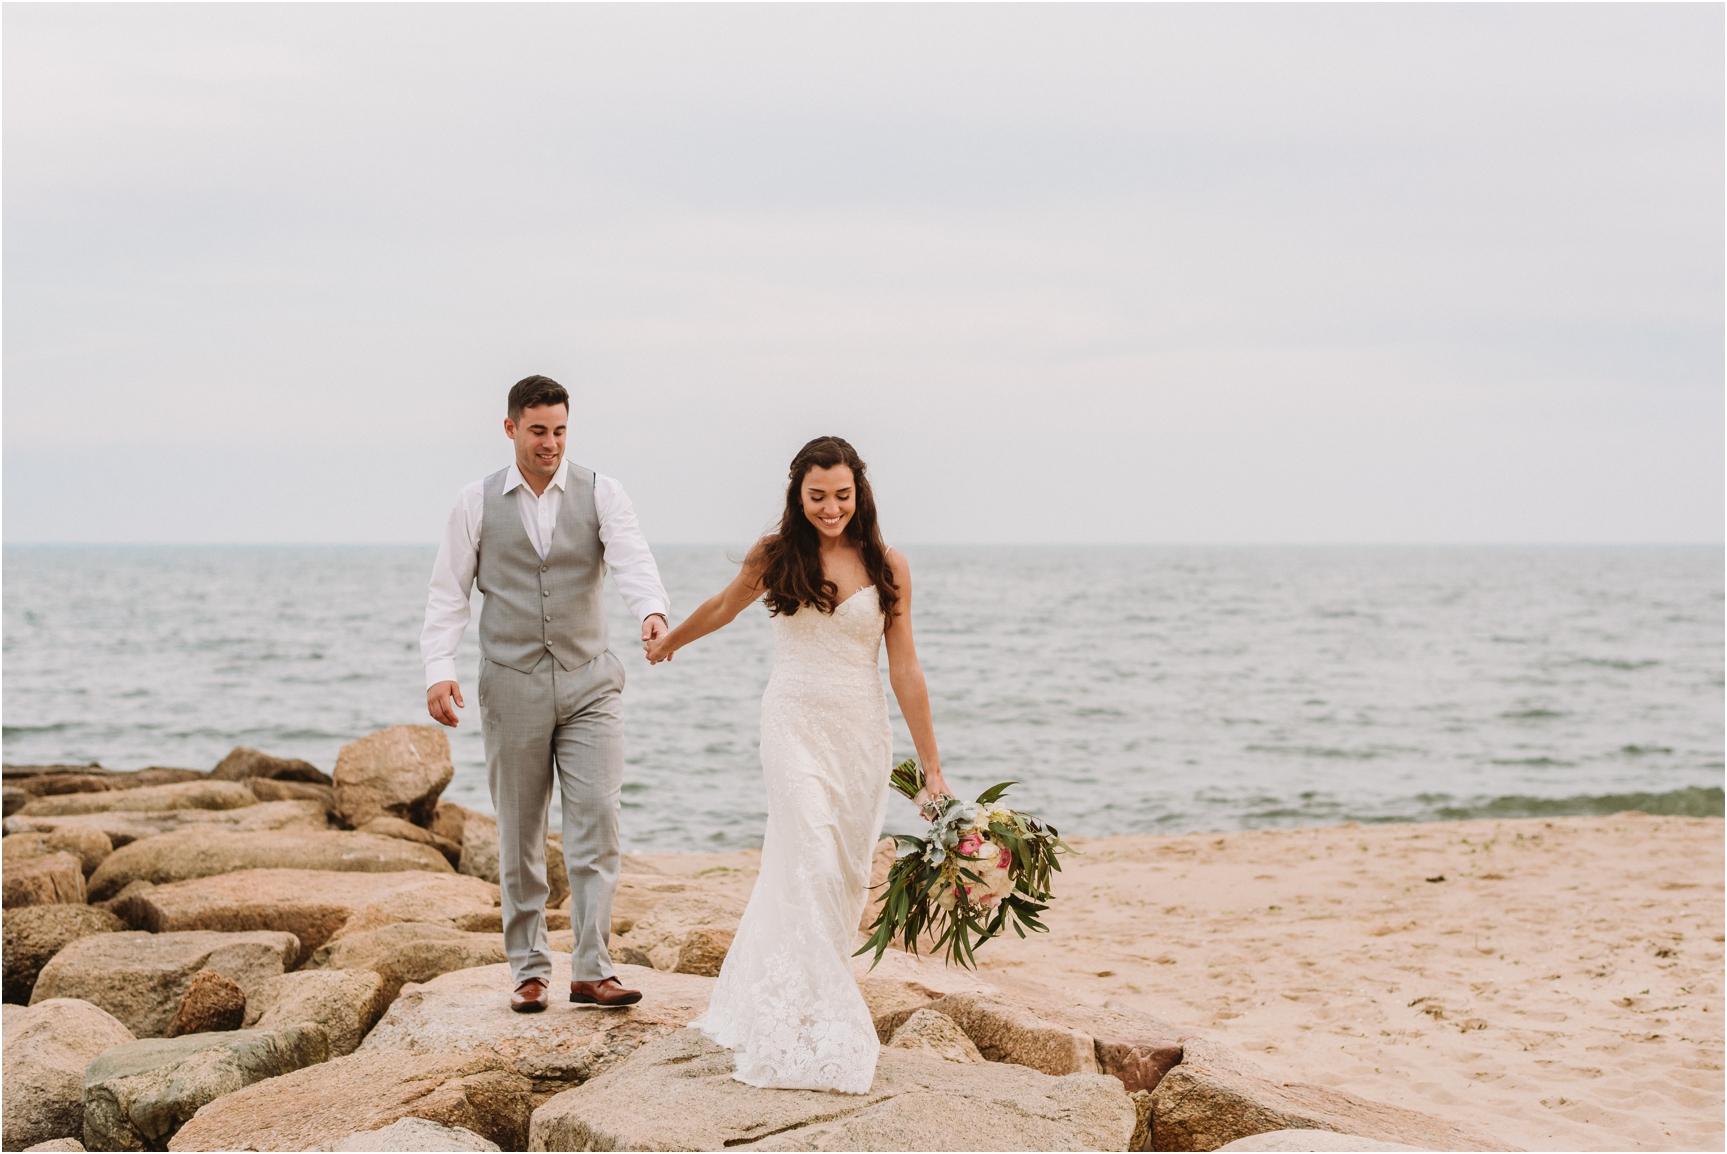 Sarah & Sam Pelham House Cape Cod Wedding Photographer-193.jpg